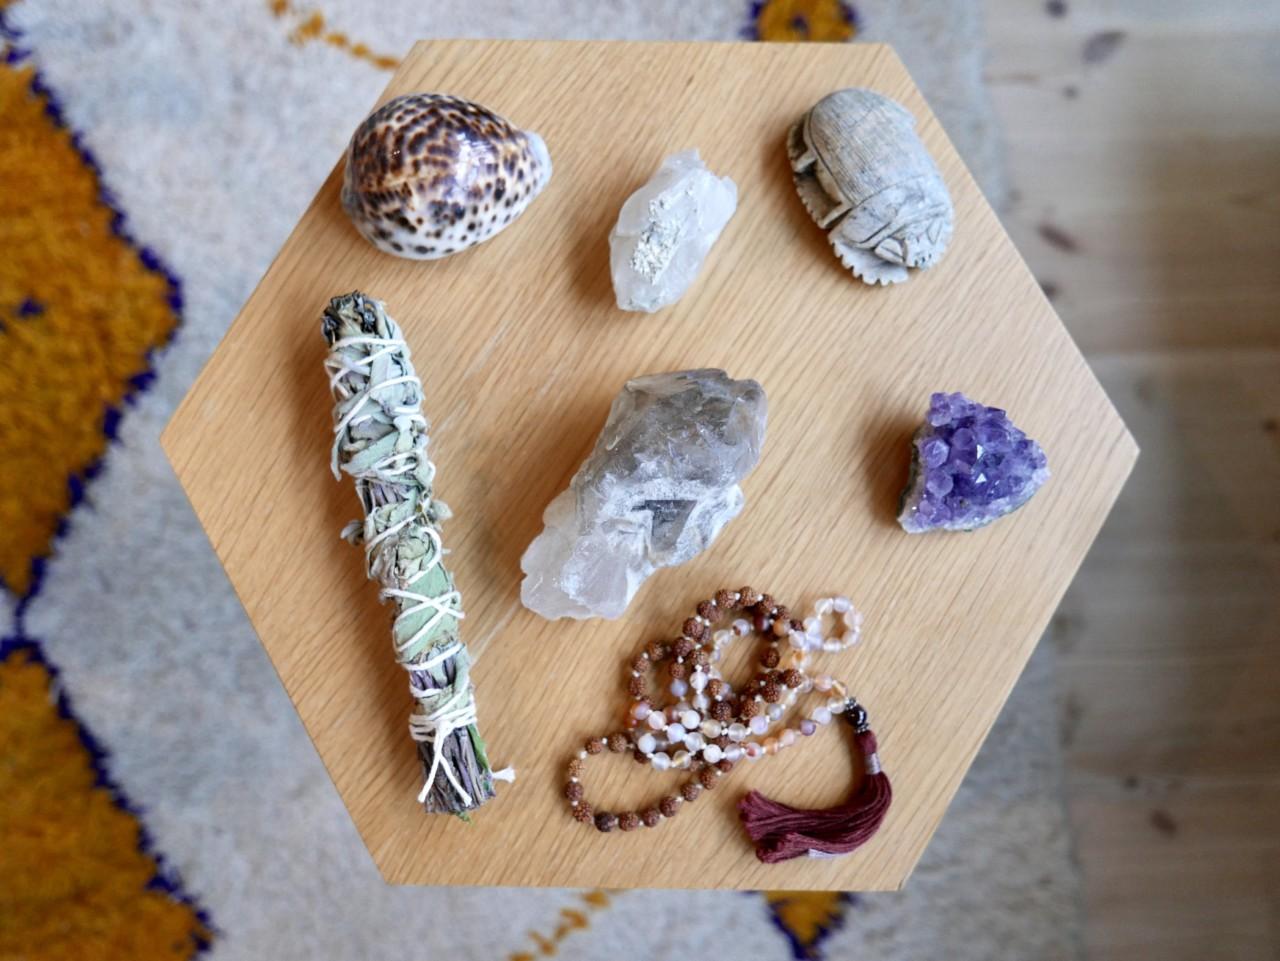 fullmaane-rituale--spiritualitet-salvie-krystaller-skjell-ametyst-mala-green-house